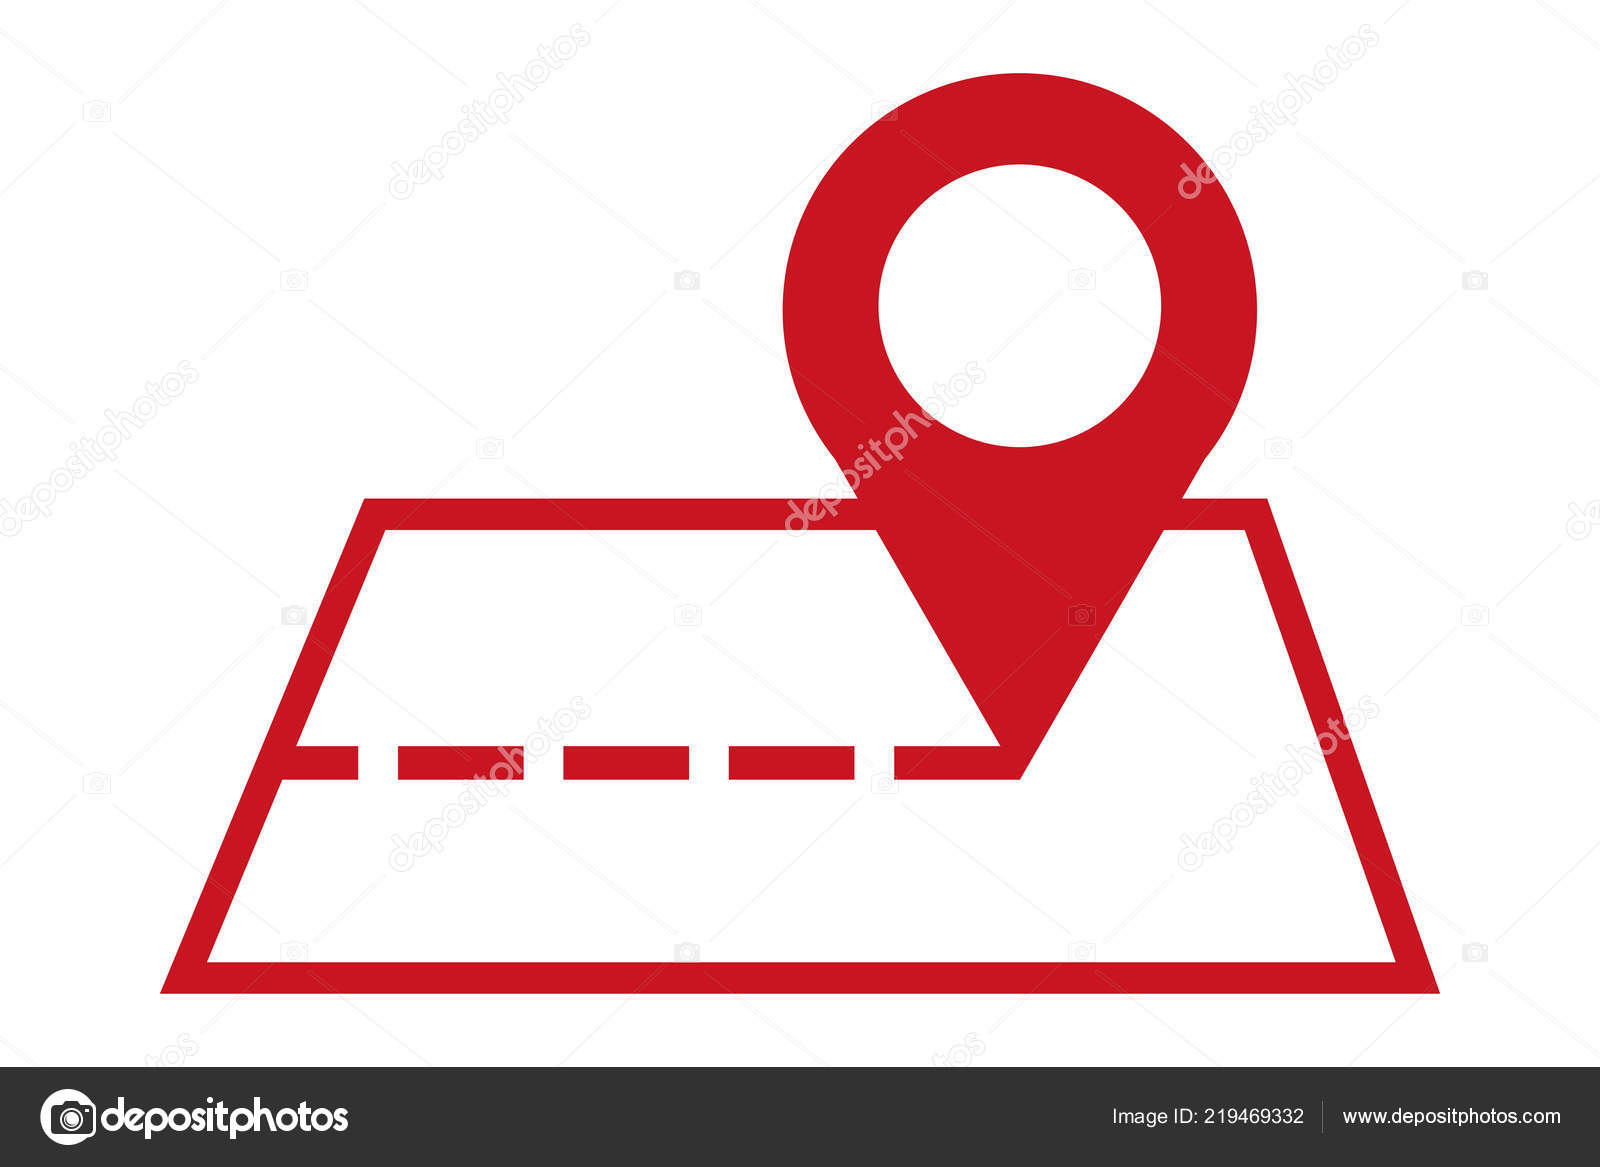 Mapa Plano Con Pin Icono De Puntero De La: Icono Puntero Mapa Símbolo Ubicación Gps Mapa Pin Señal